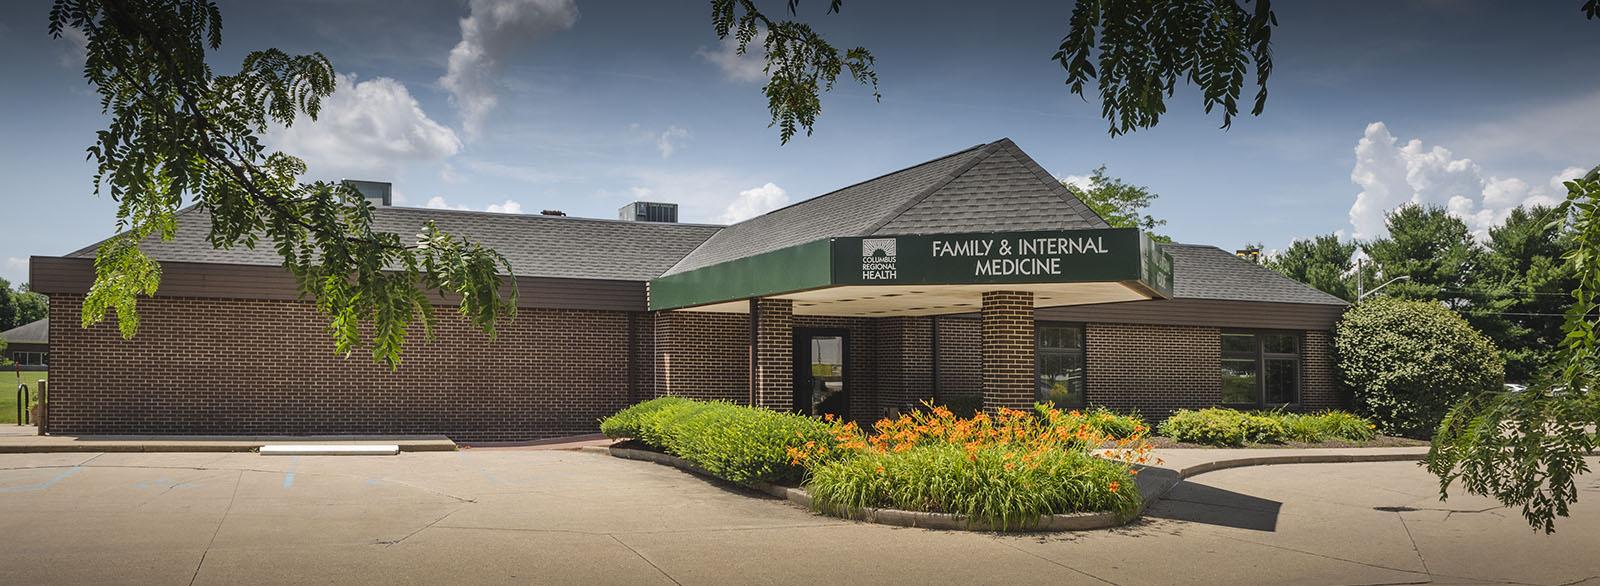 Family and Internal Medicine exterior